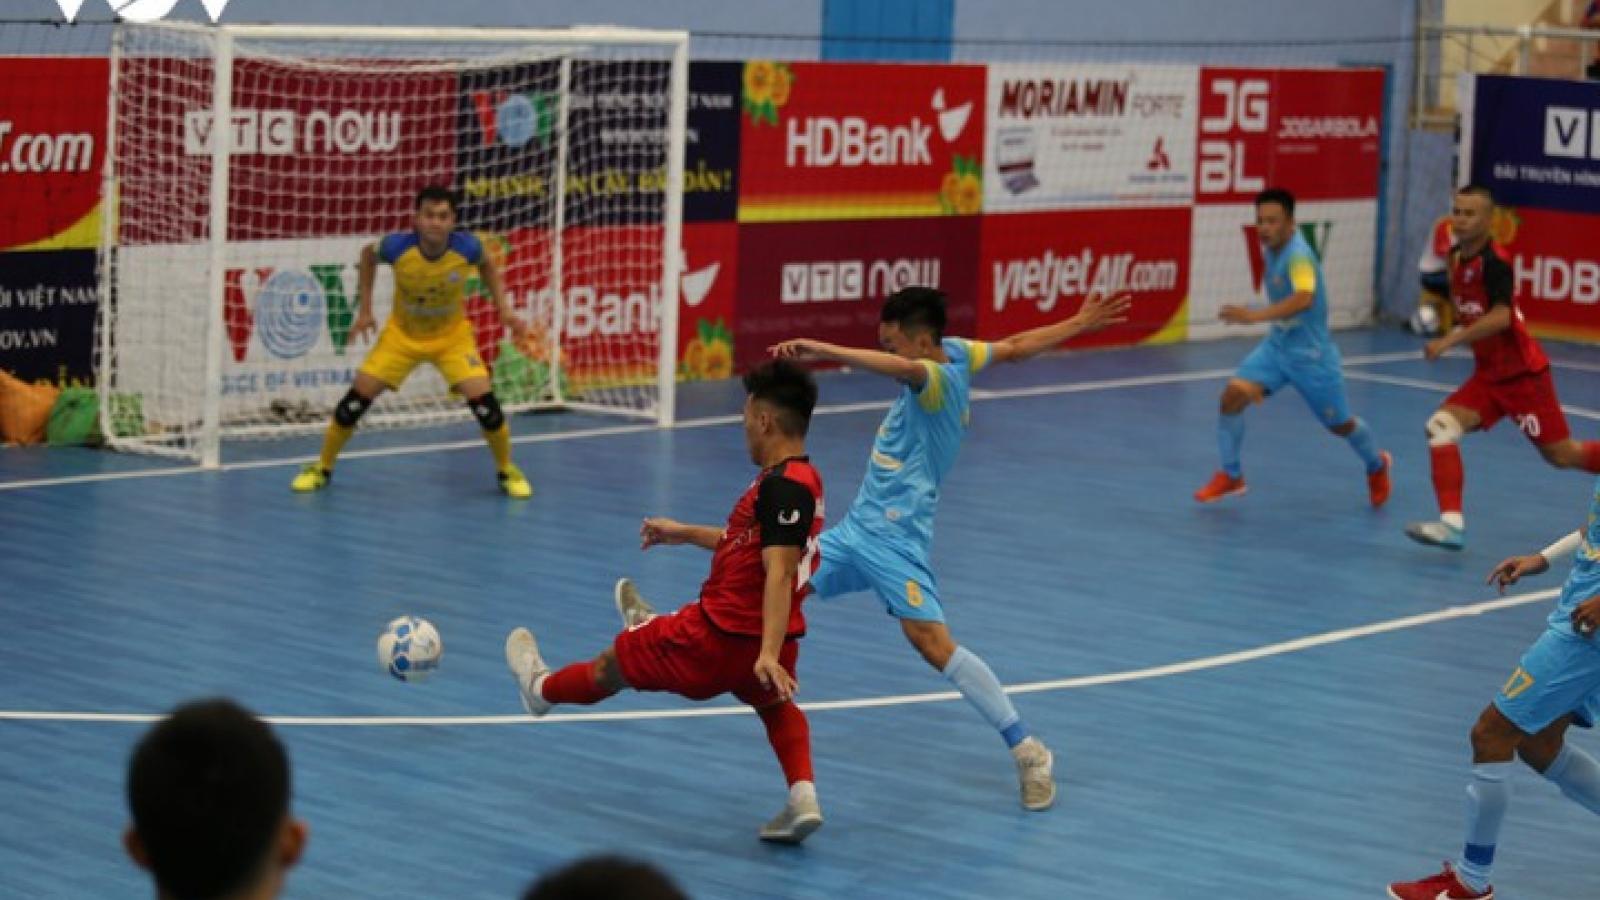 Xem trực tiếp Futsal HDBank VĐQG 2020: Vietfootball - Sanvinest Sanna Khánh Hòa